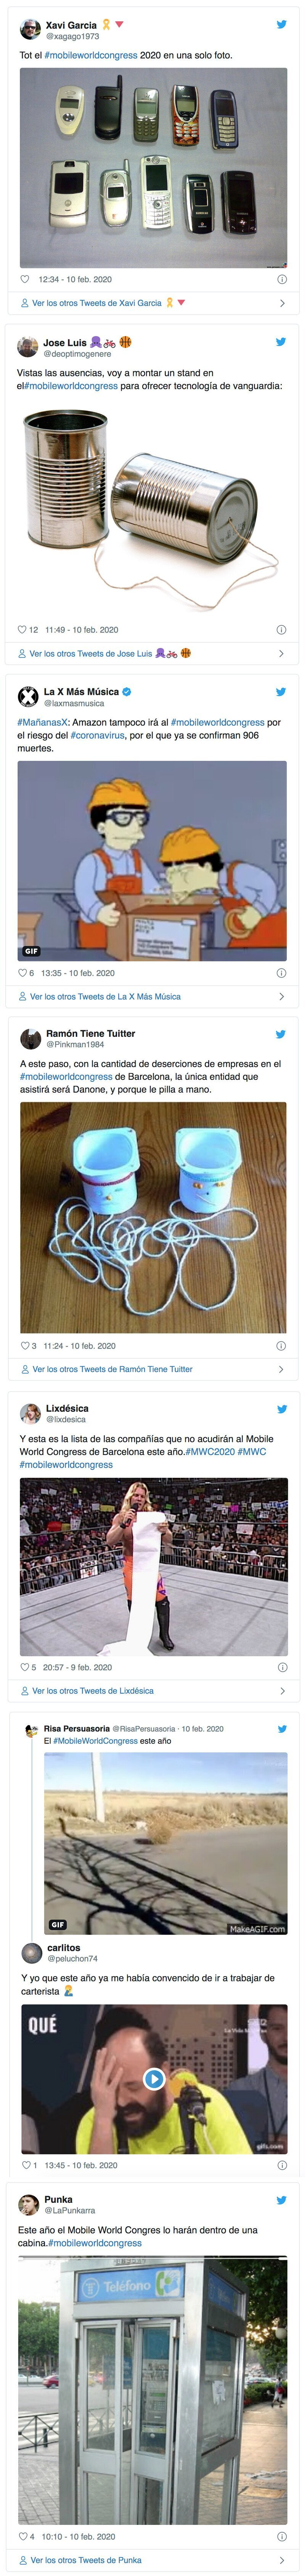 1065 - El Mobile World Congress de Barcelona peligra por el coronavirus, e internet se llena de memes